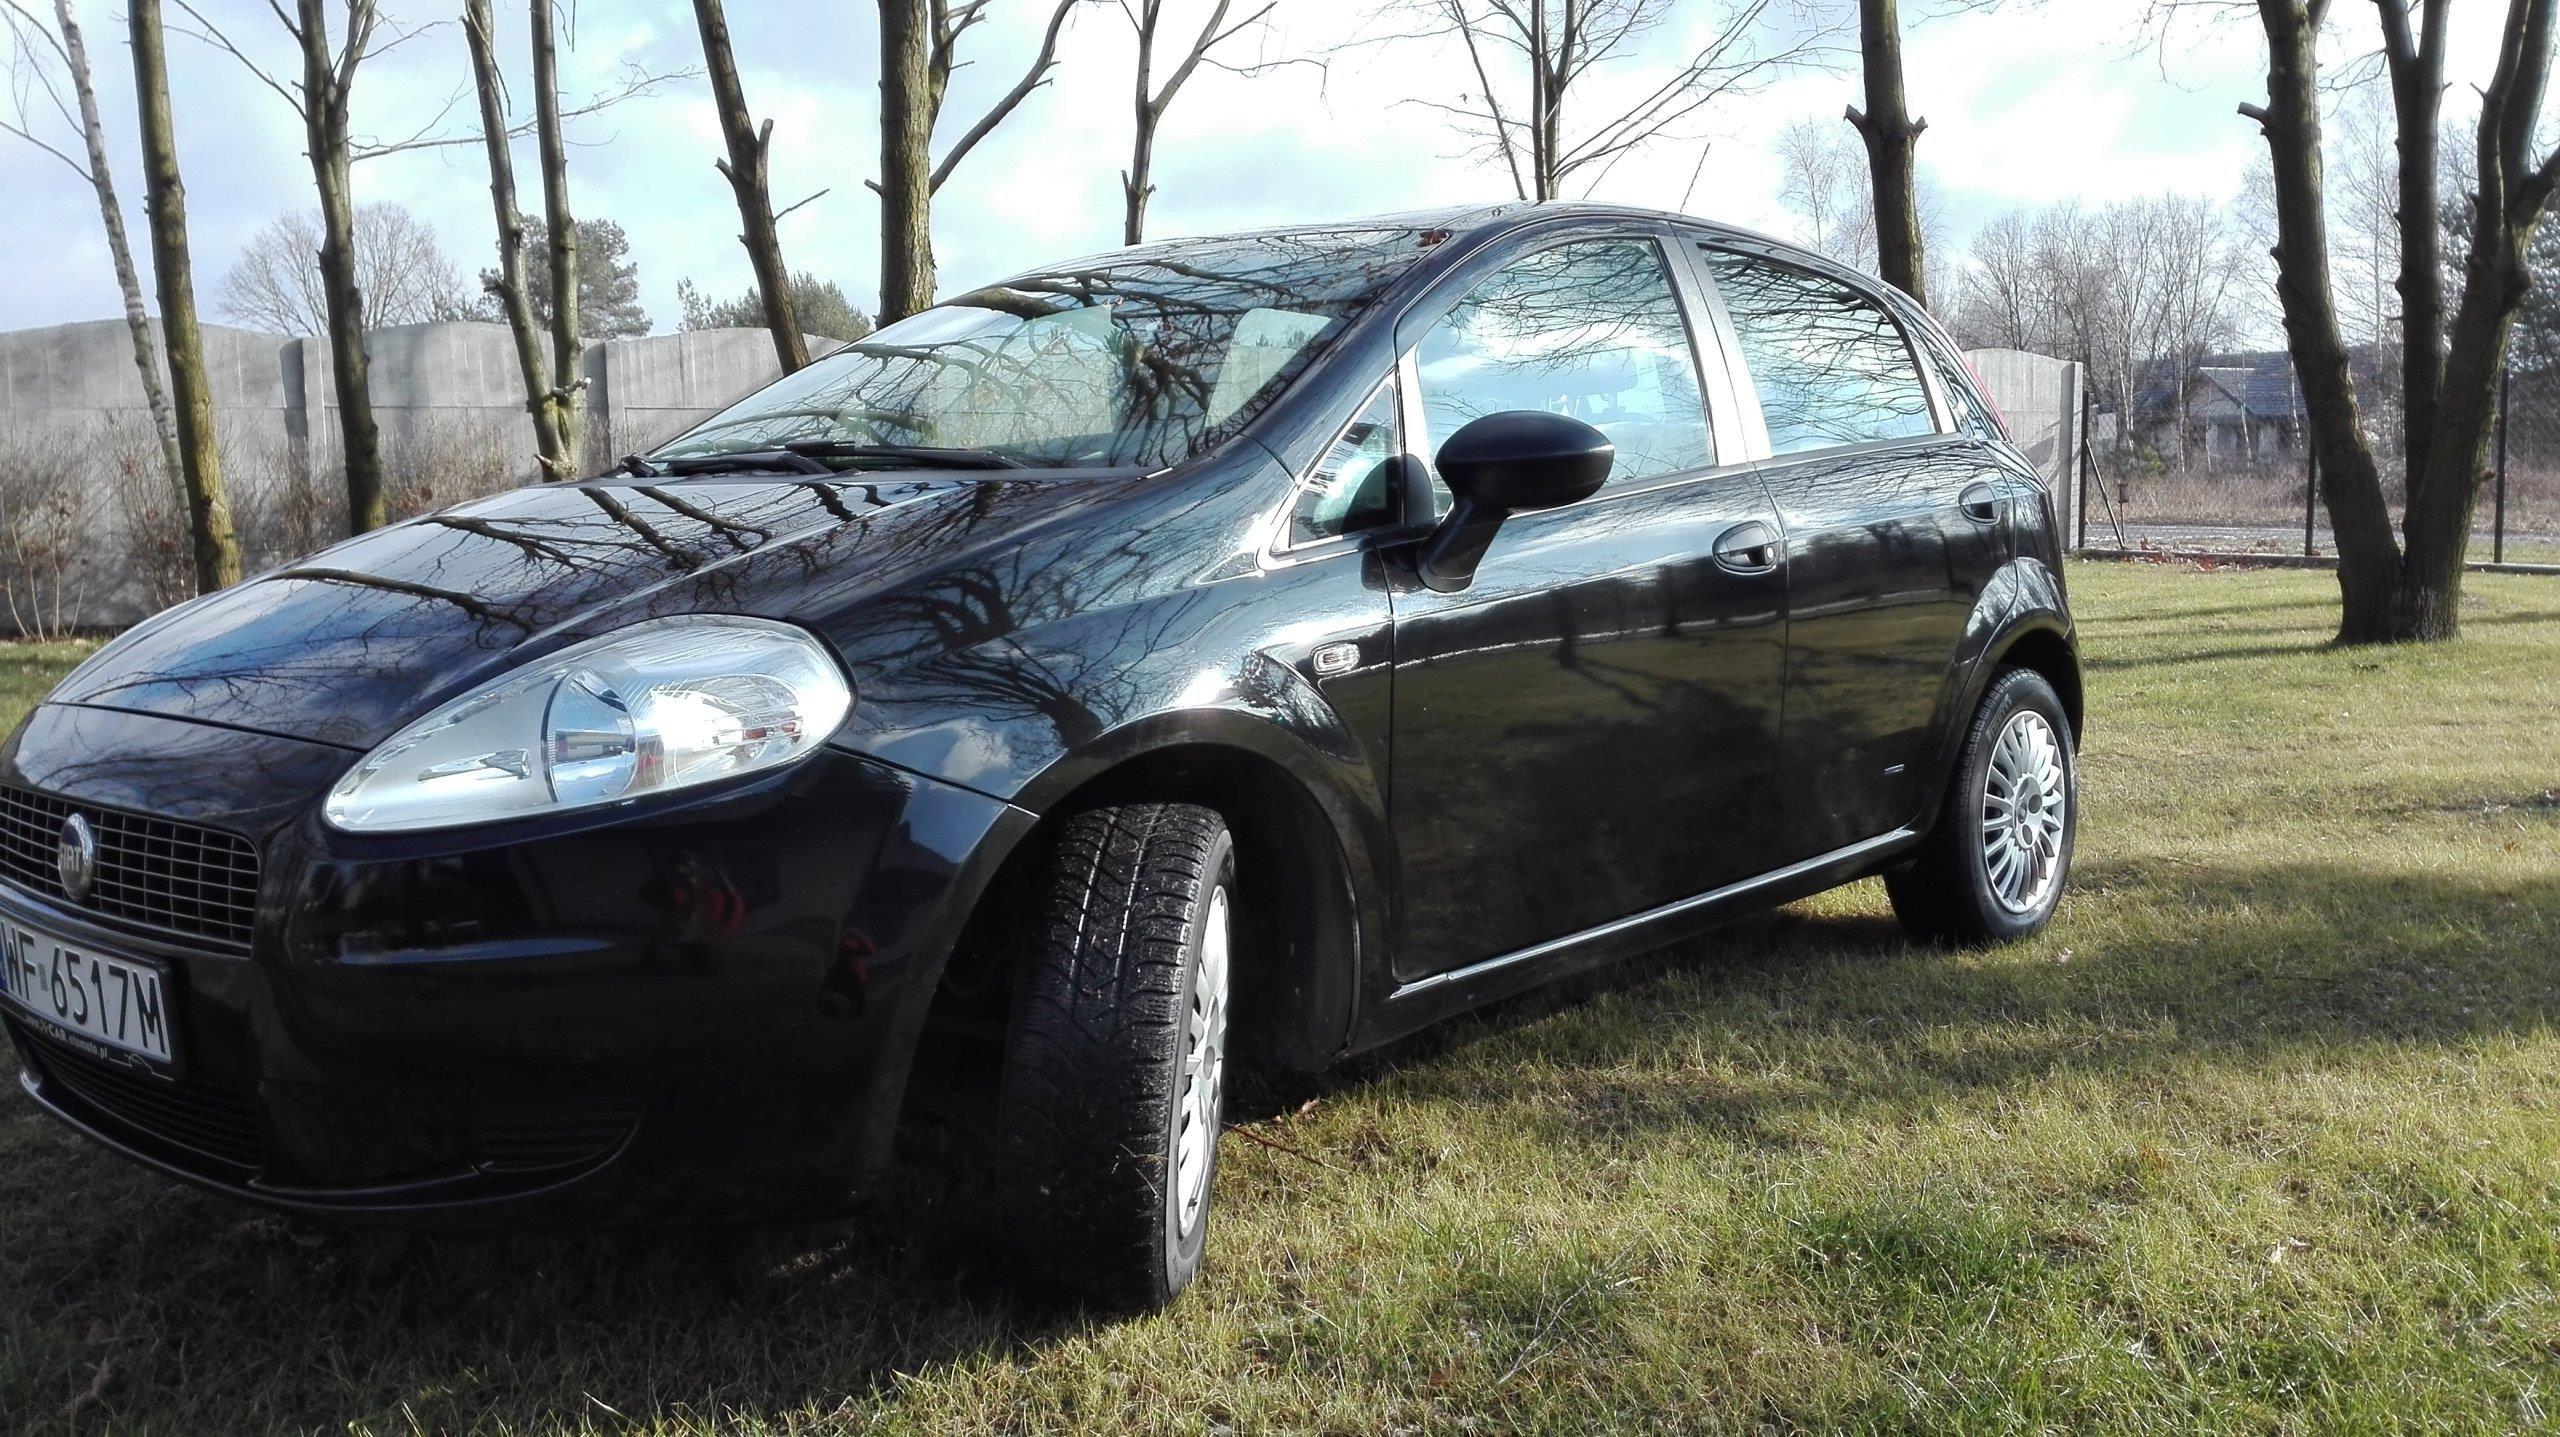 Fiat Grande Punto 2006 Benzyna 80km Sedan Czarny Opinie I Ceny Na